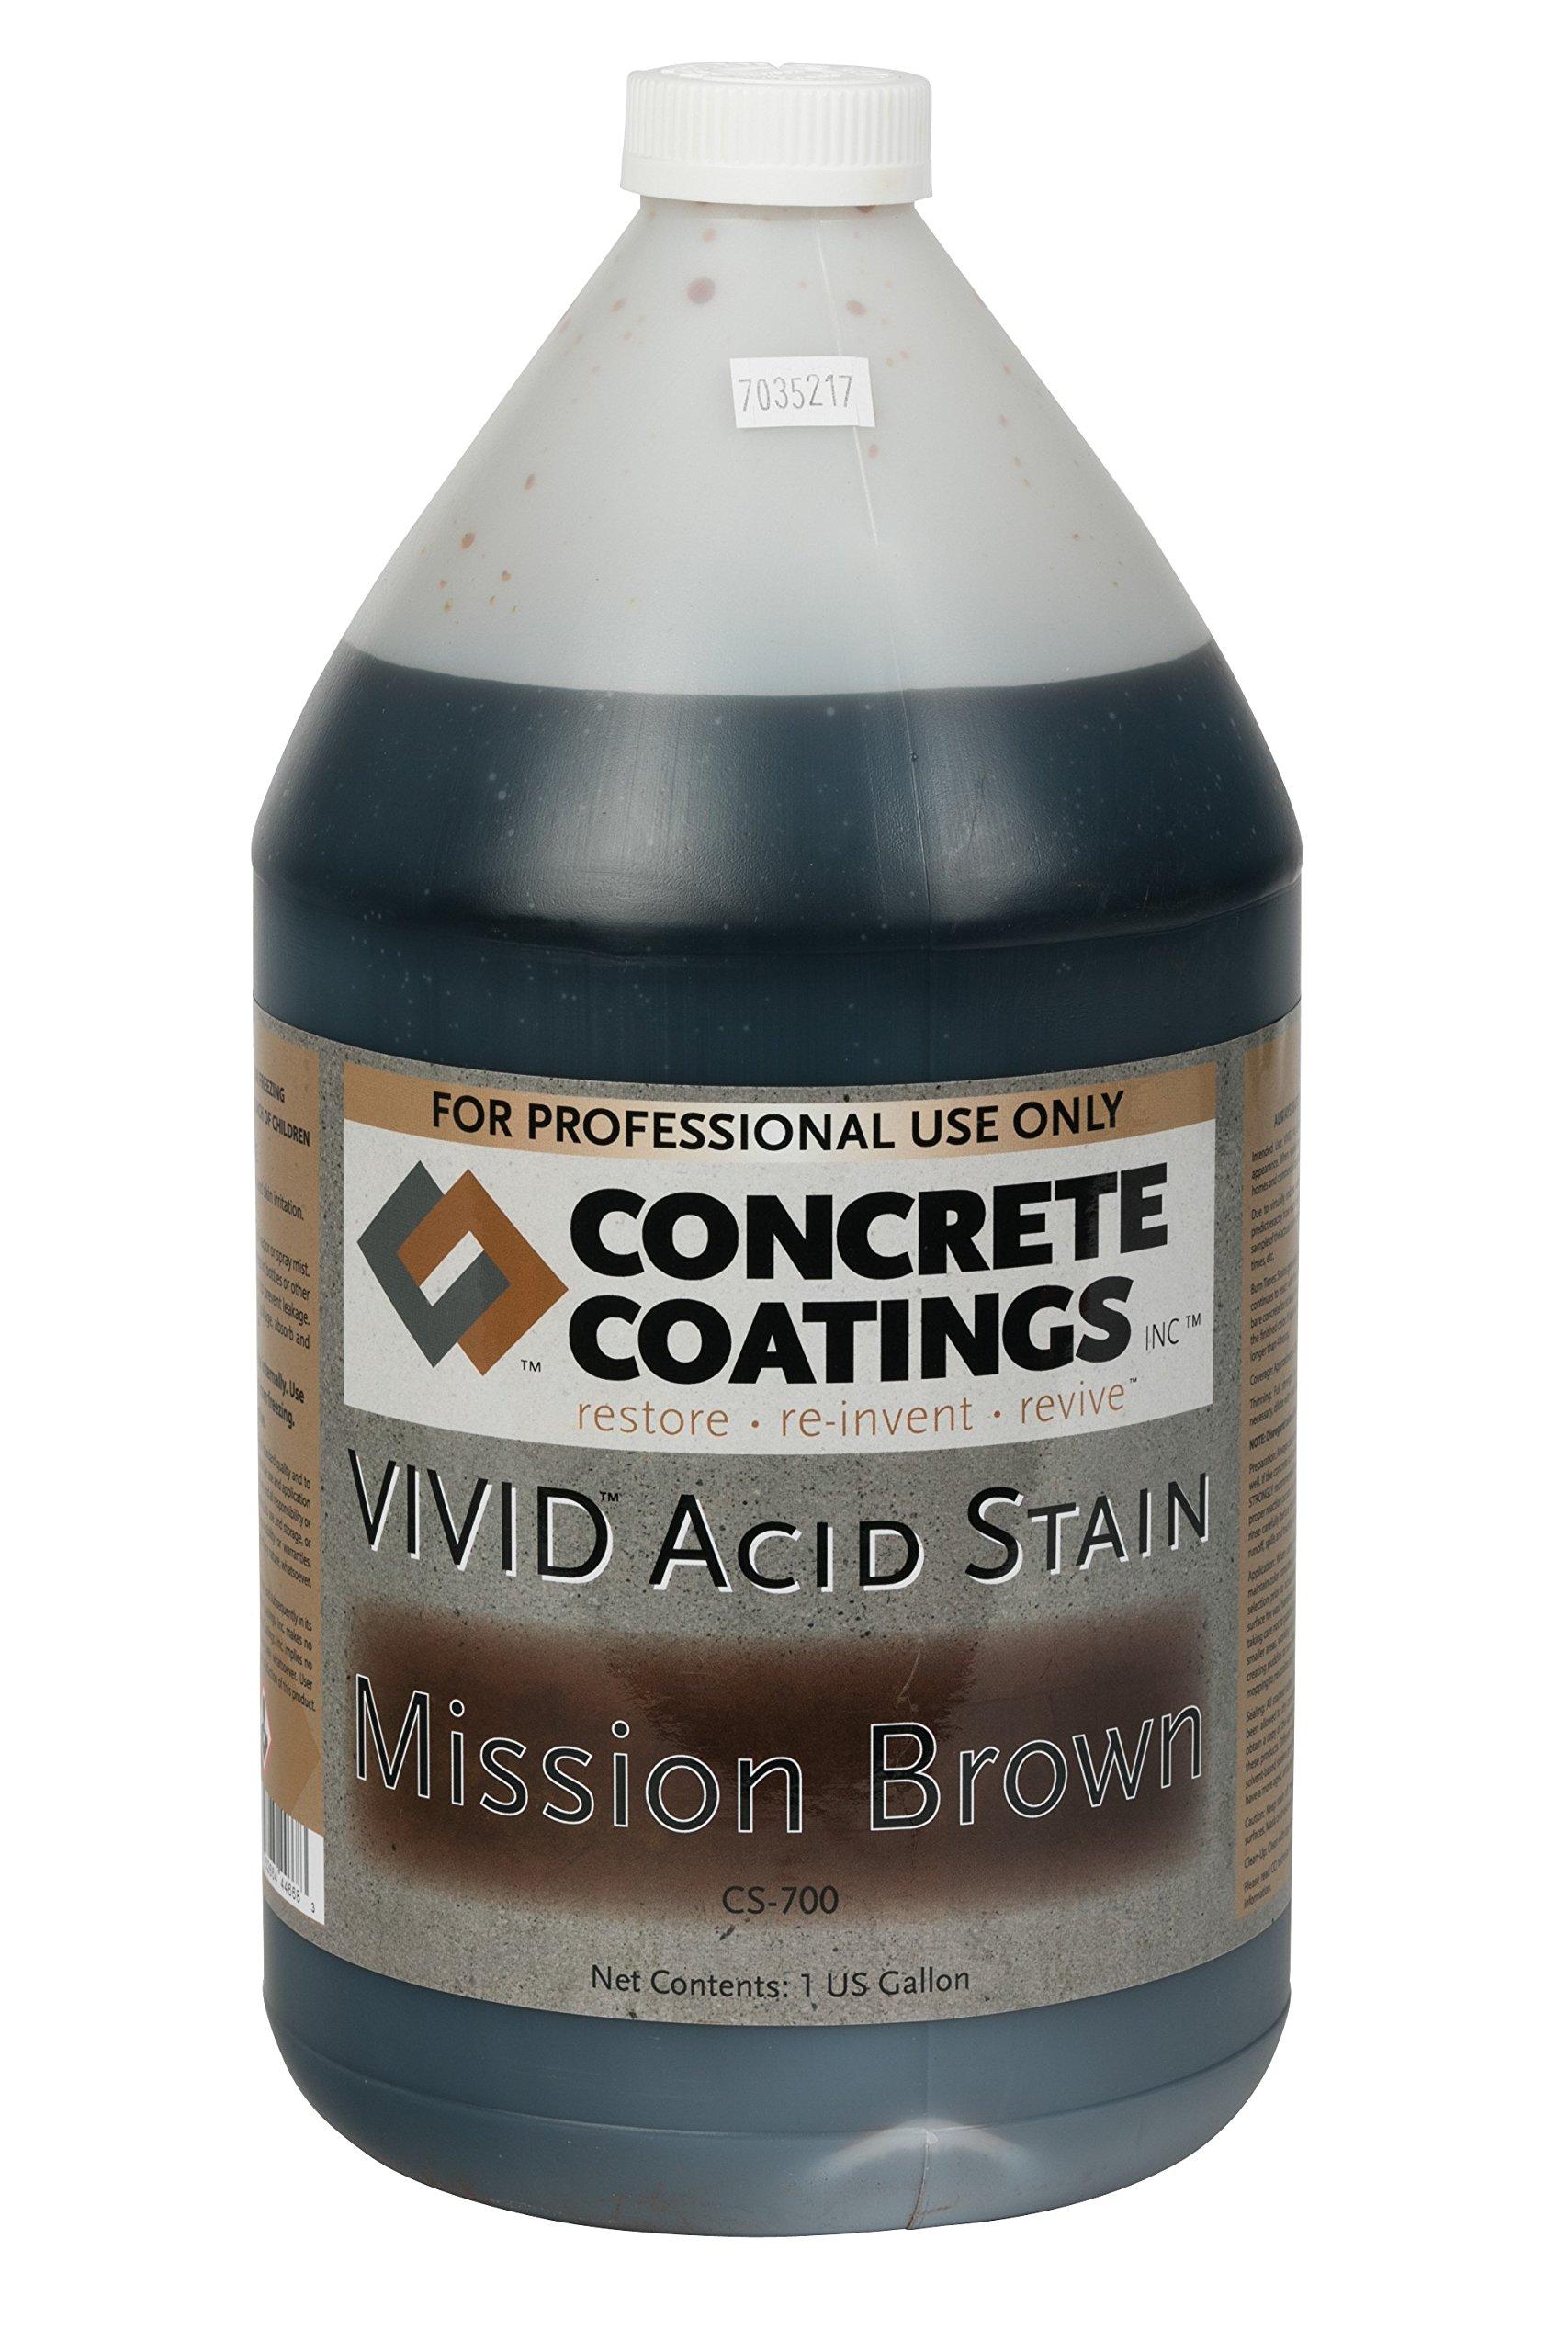 VIVID Acid Stain - 1 Gal - Mission Brown (Rich, Medium Rusty Brown)